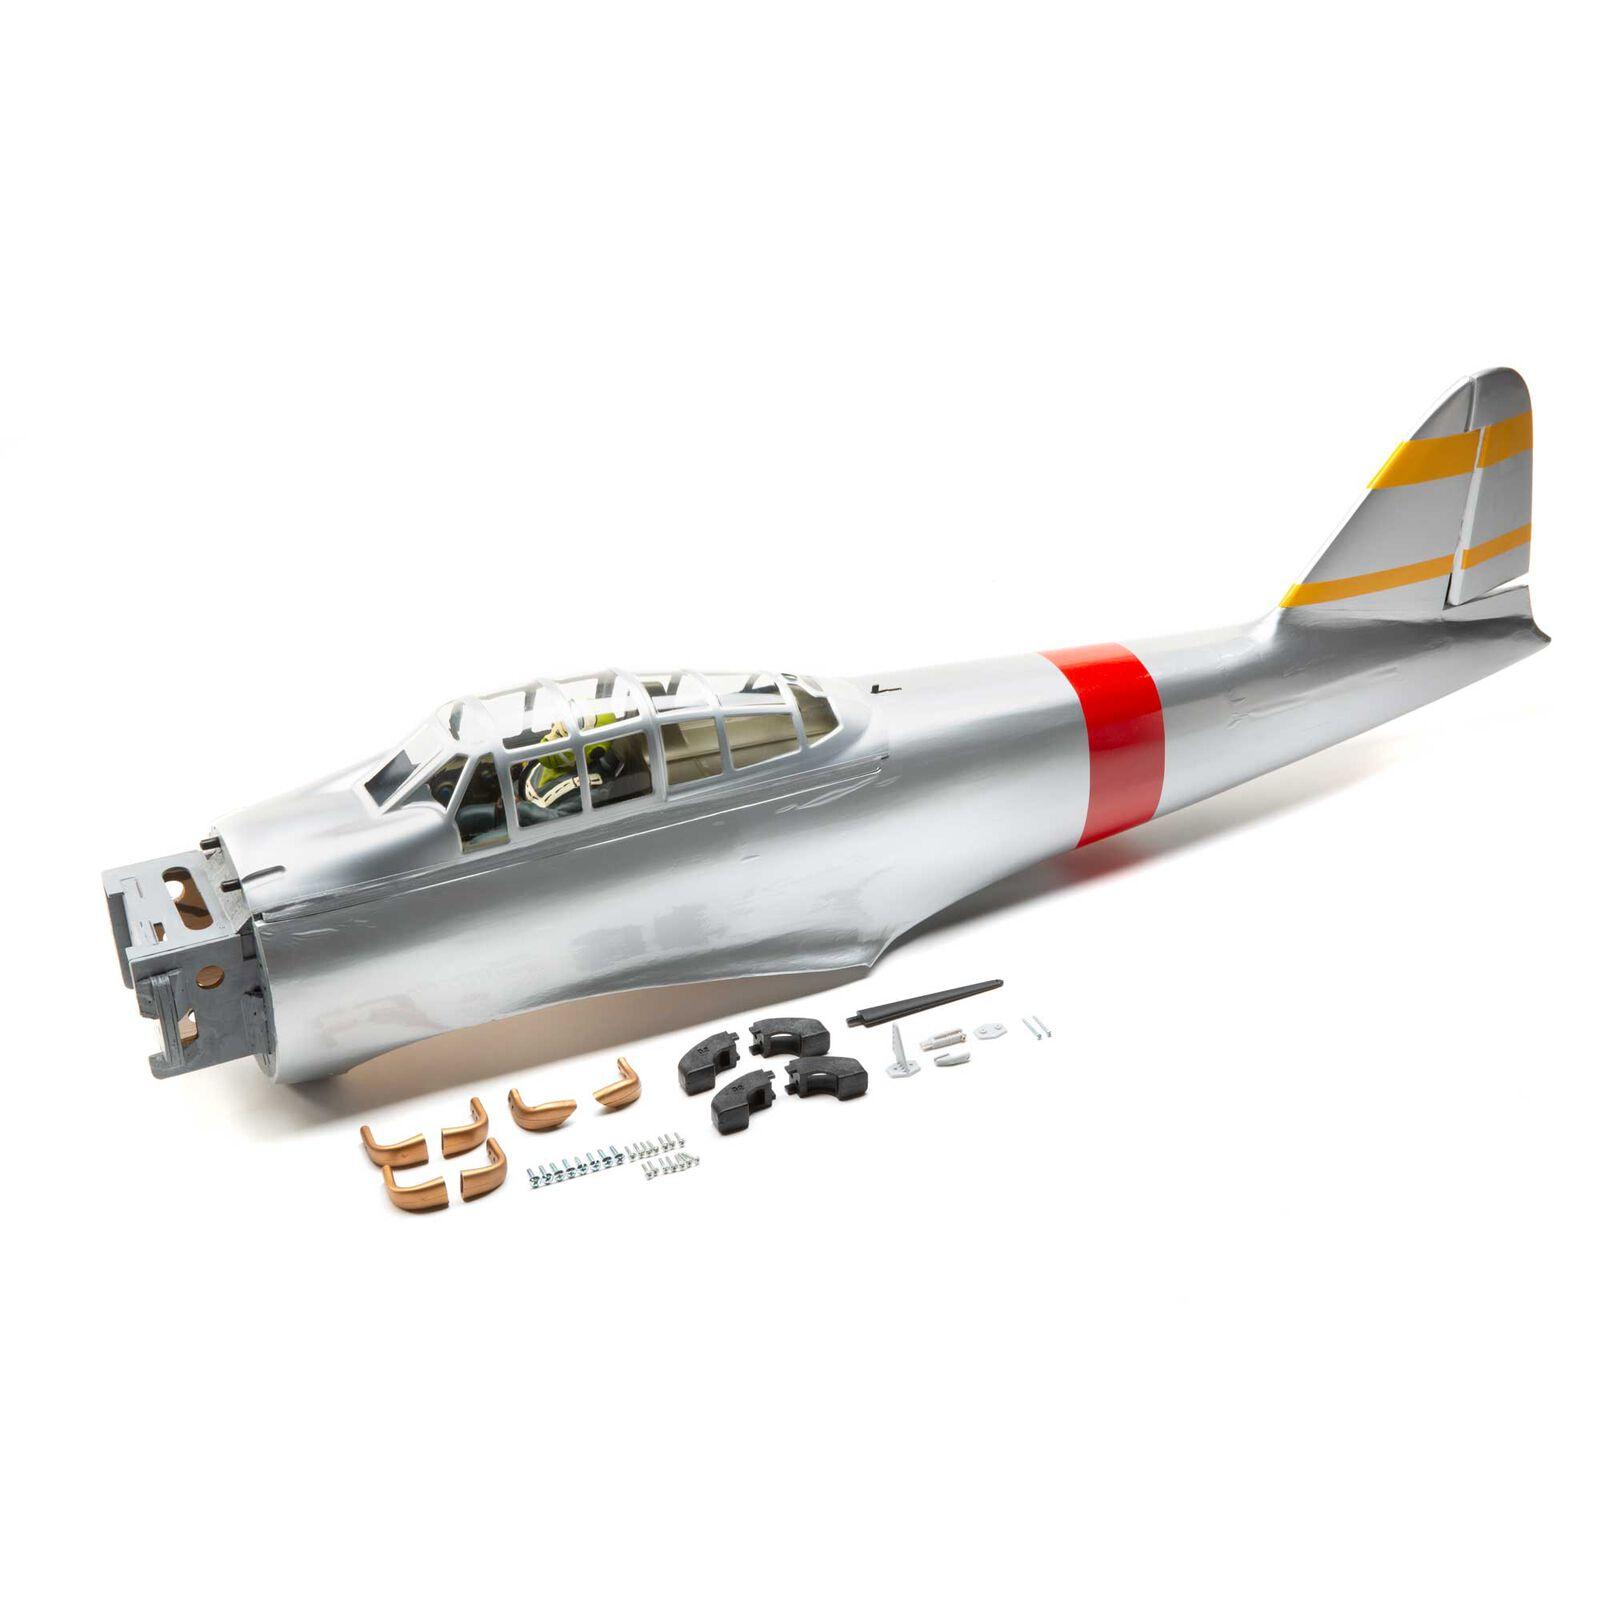 "Fuselage: ZERO A6M EP/GP .46-.55 ARF 55"""